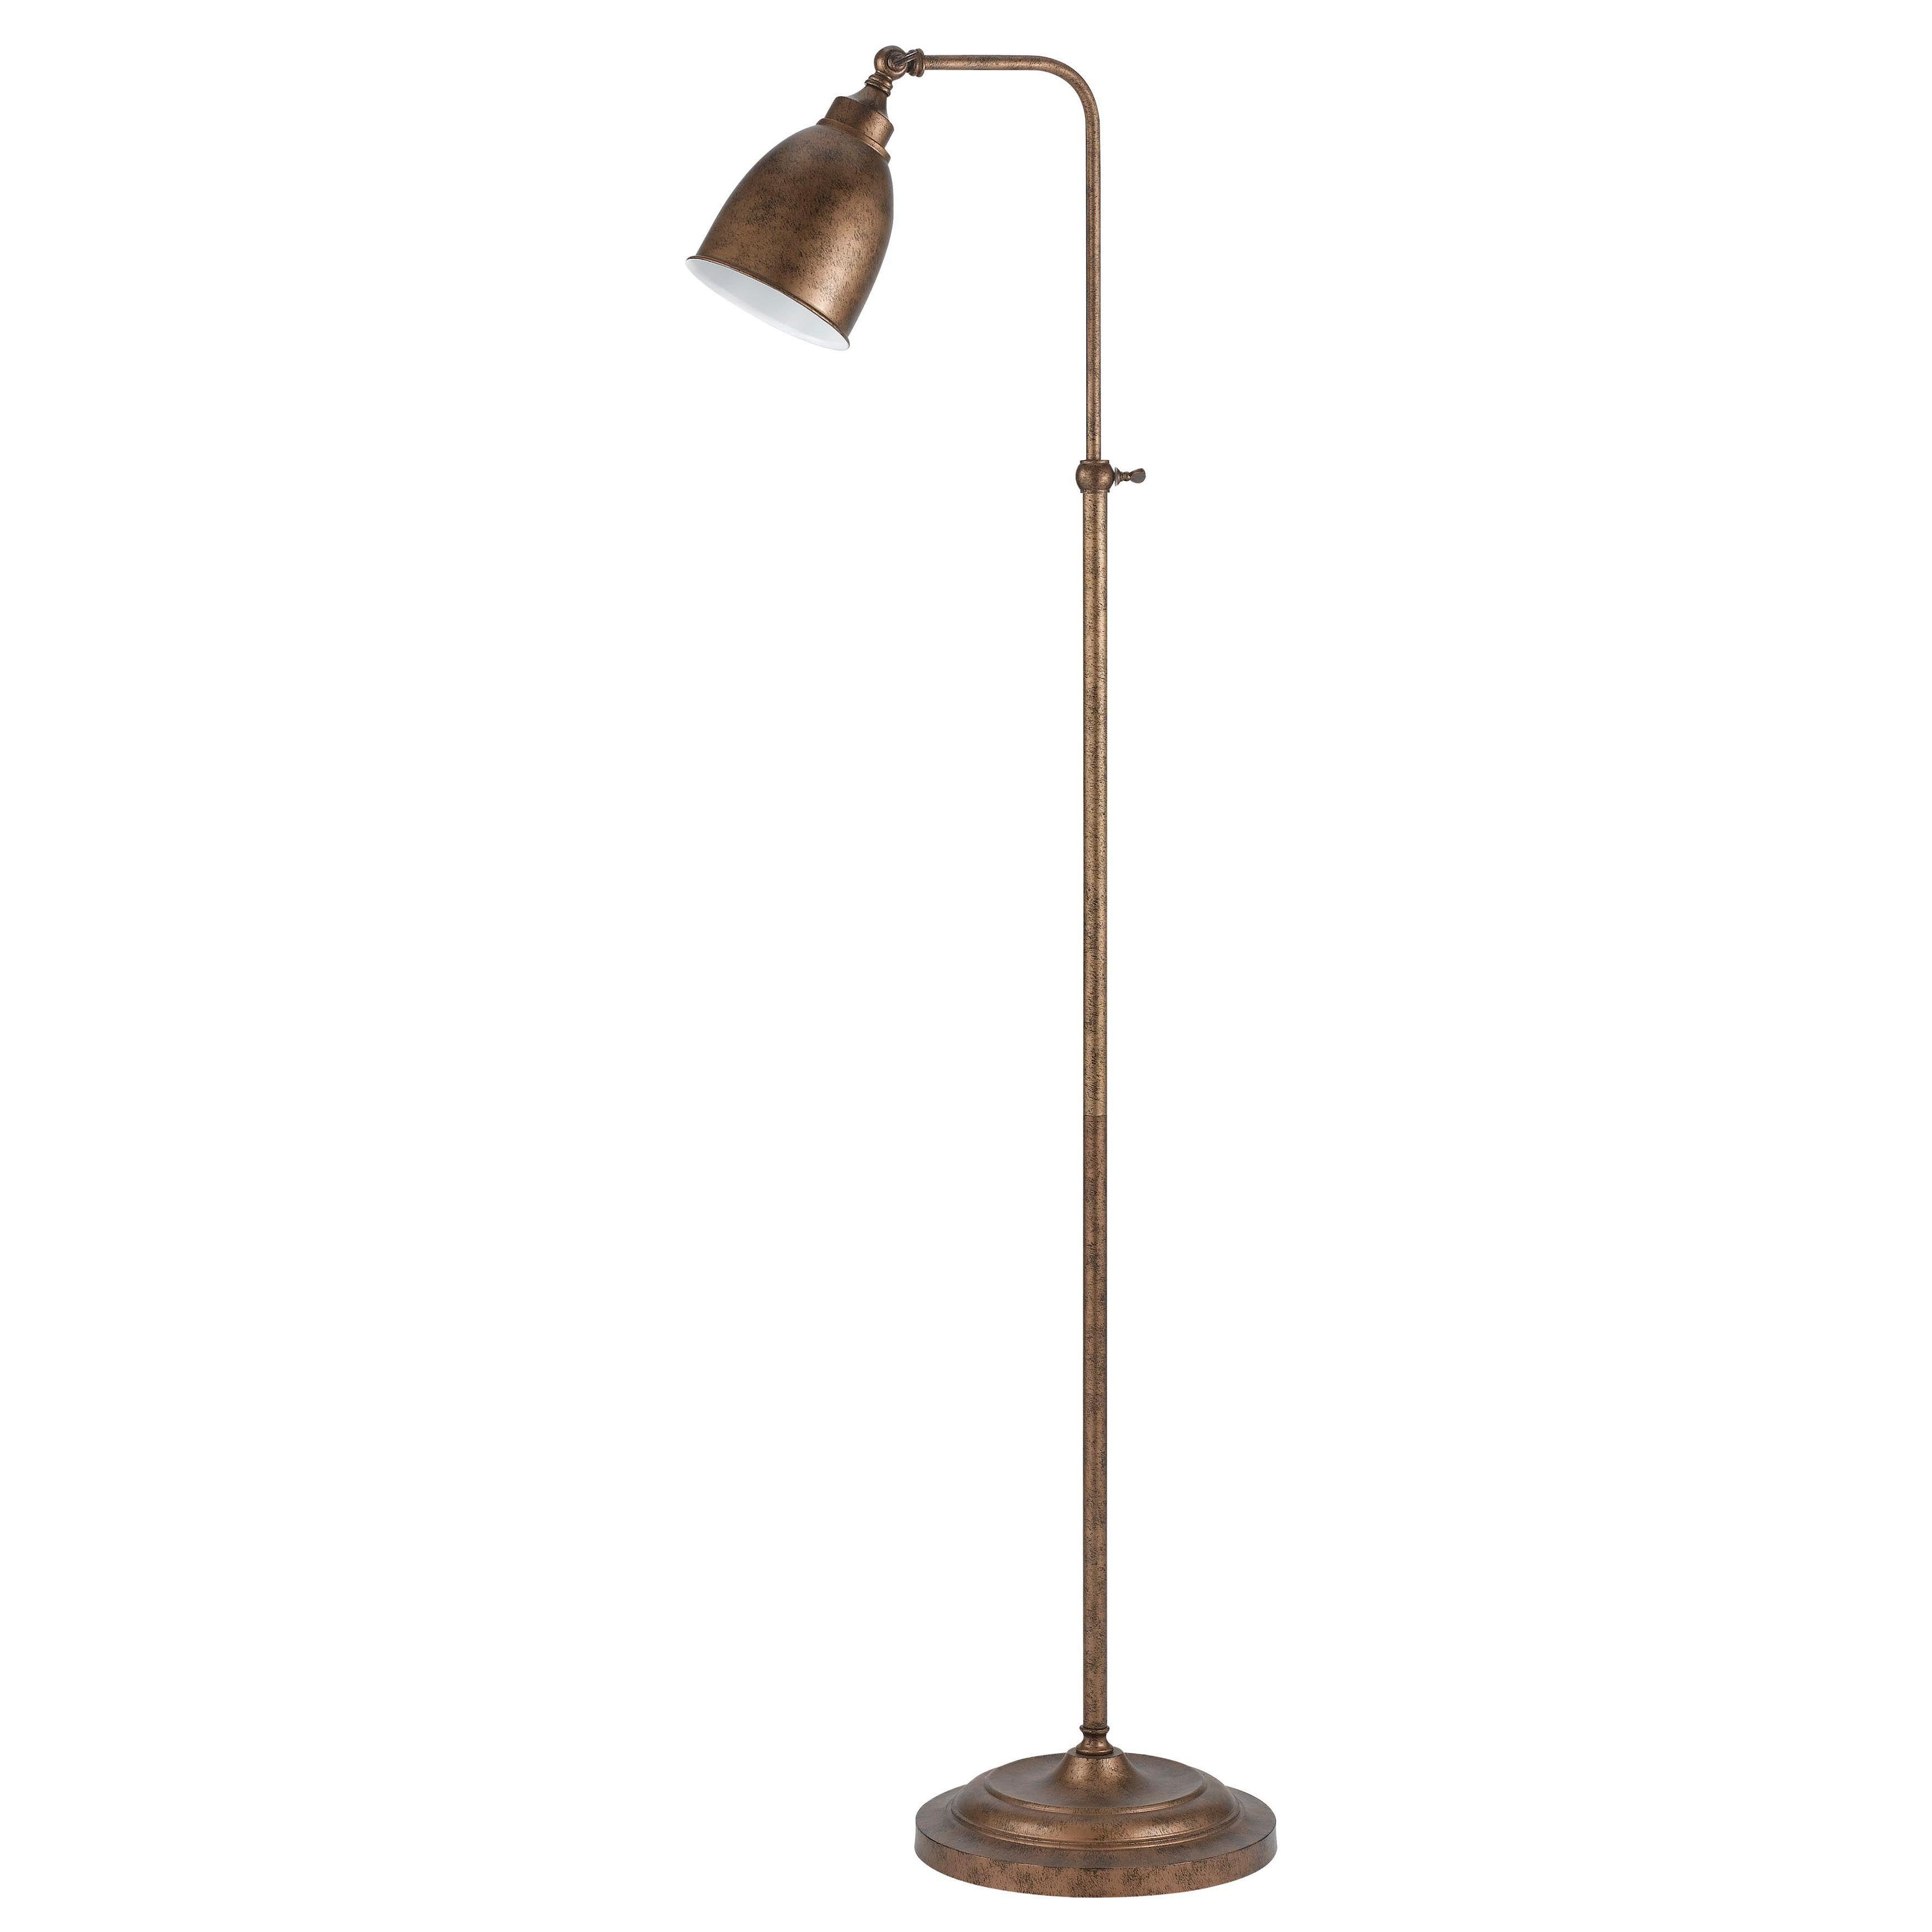 Cal Lighting 'B02032FL' Pharmarcy Pole Floor Lamp